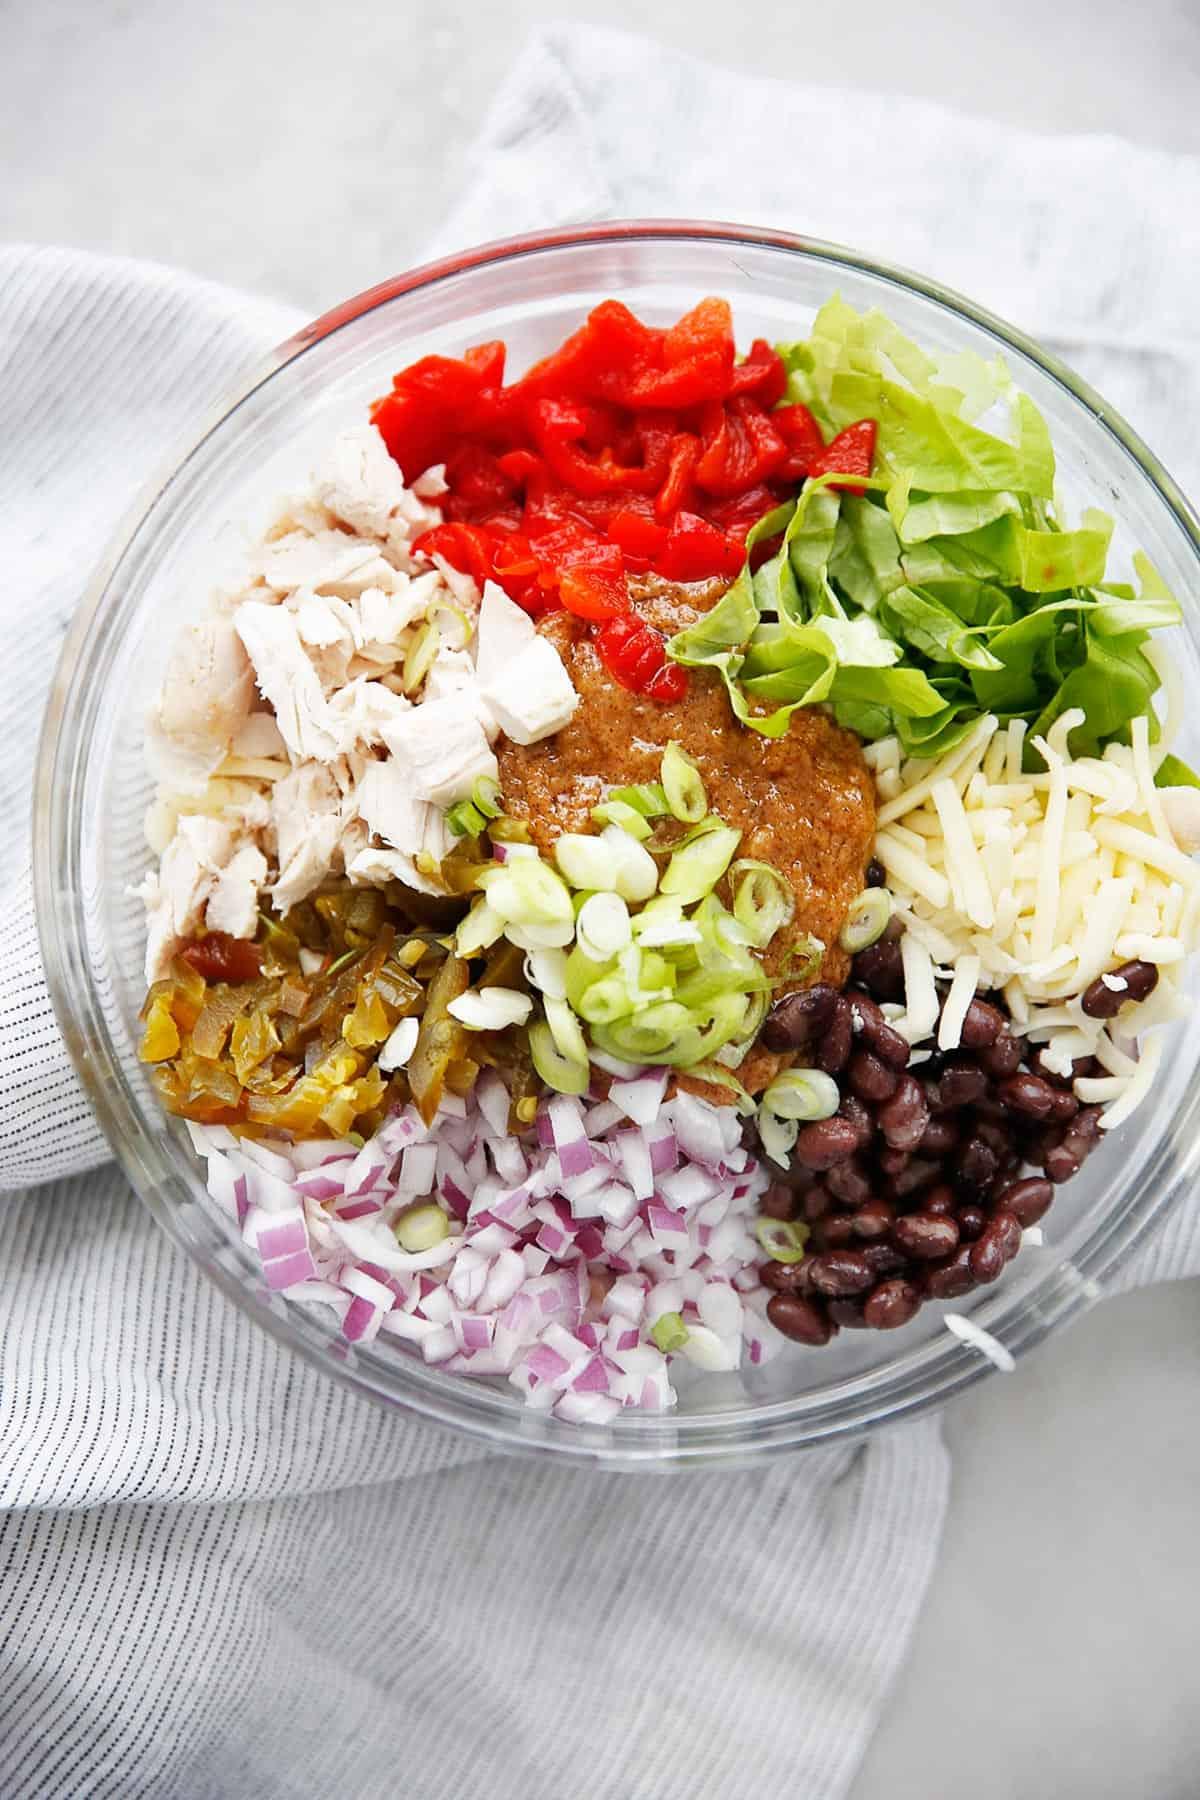 Taco chicken salad ingredients